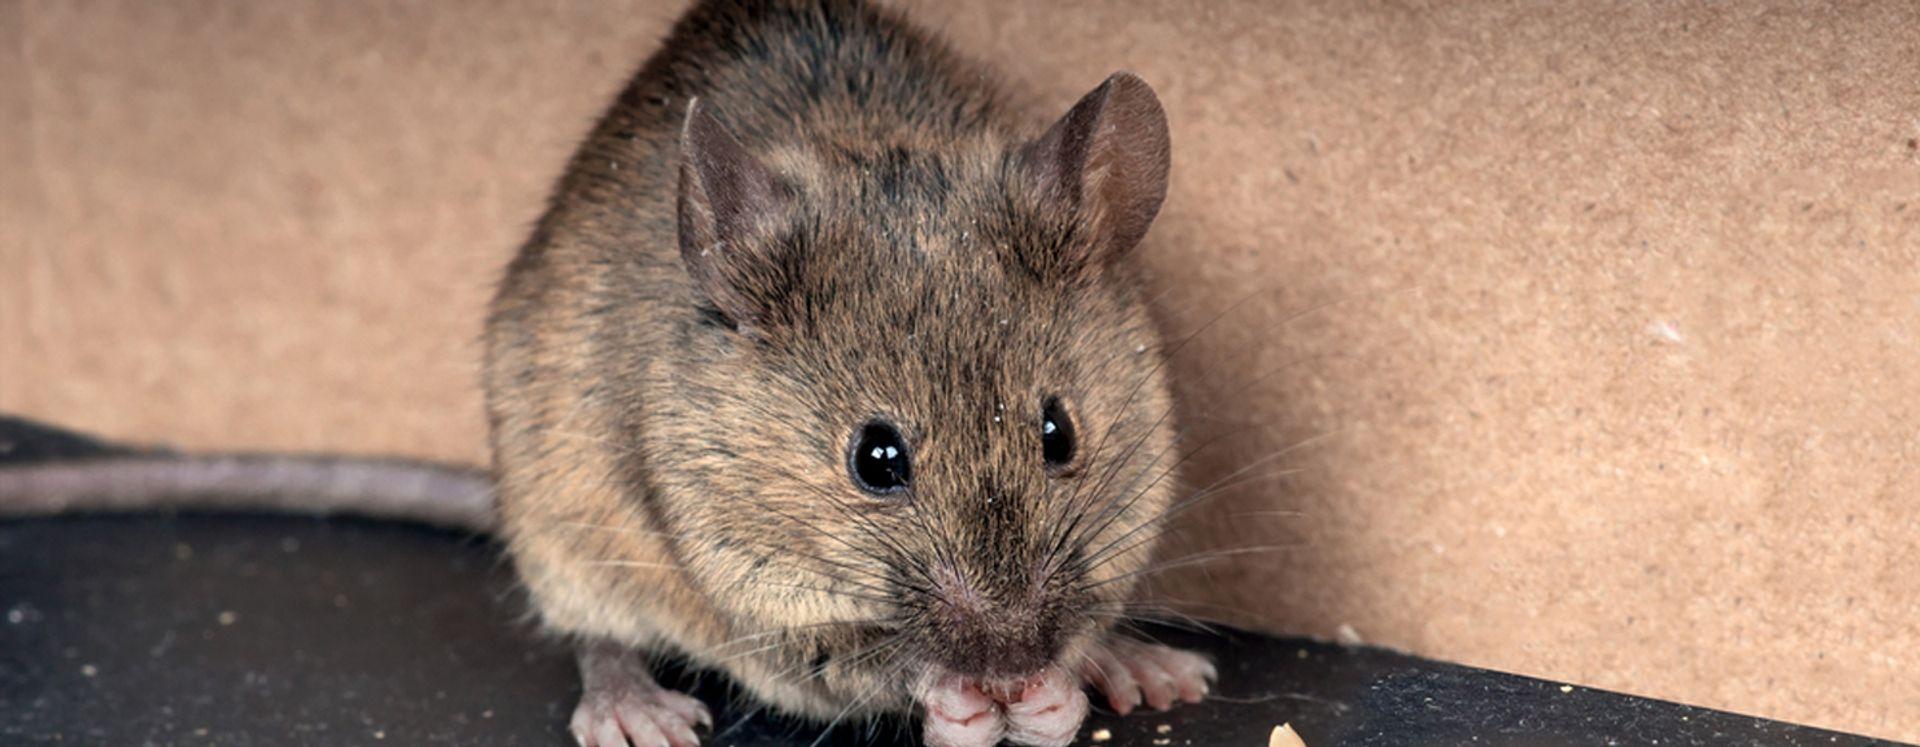 Hvordan undgår man mus? Få svaret her - Anticimex